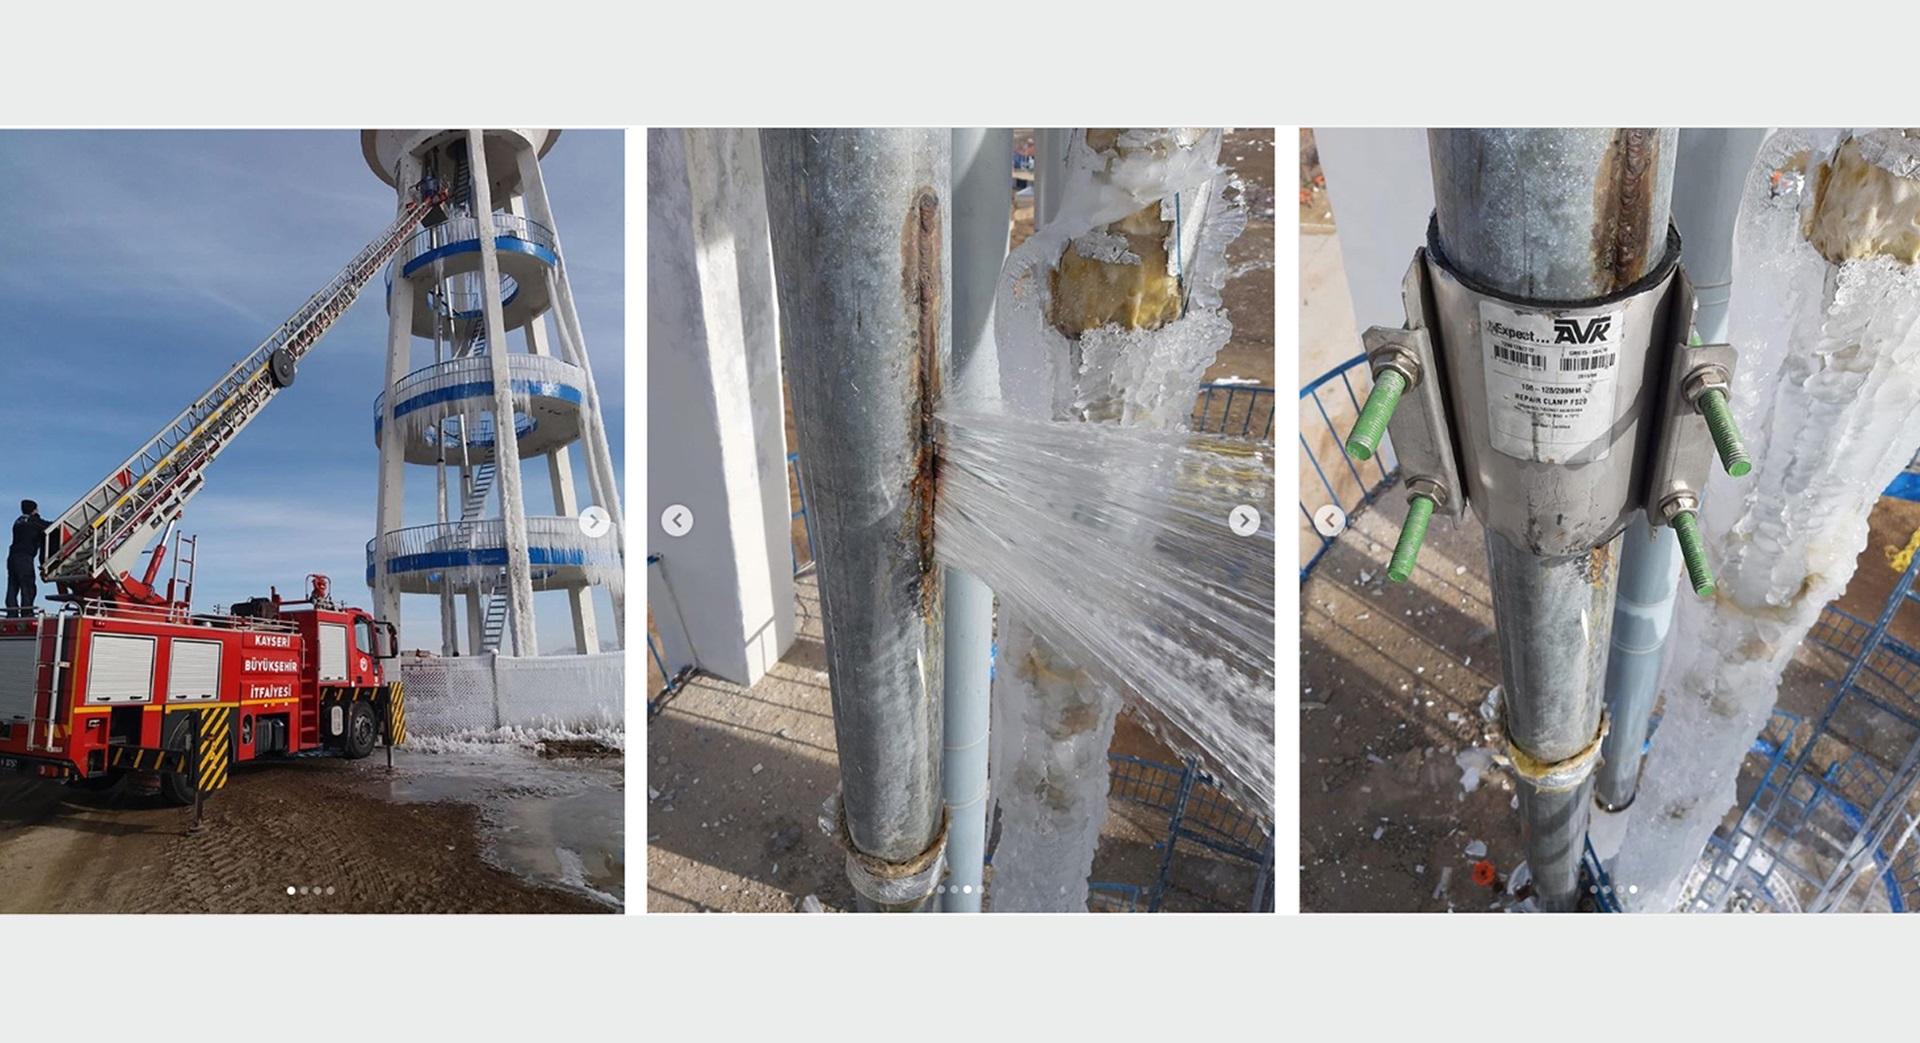 AVK repair clamp installed at Turkish water authority